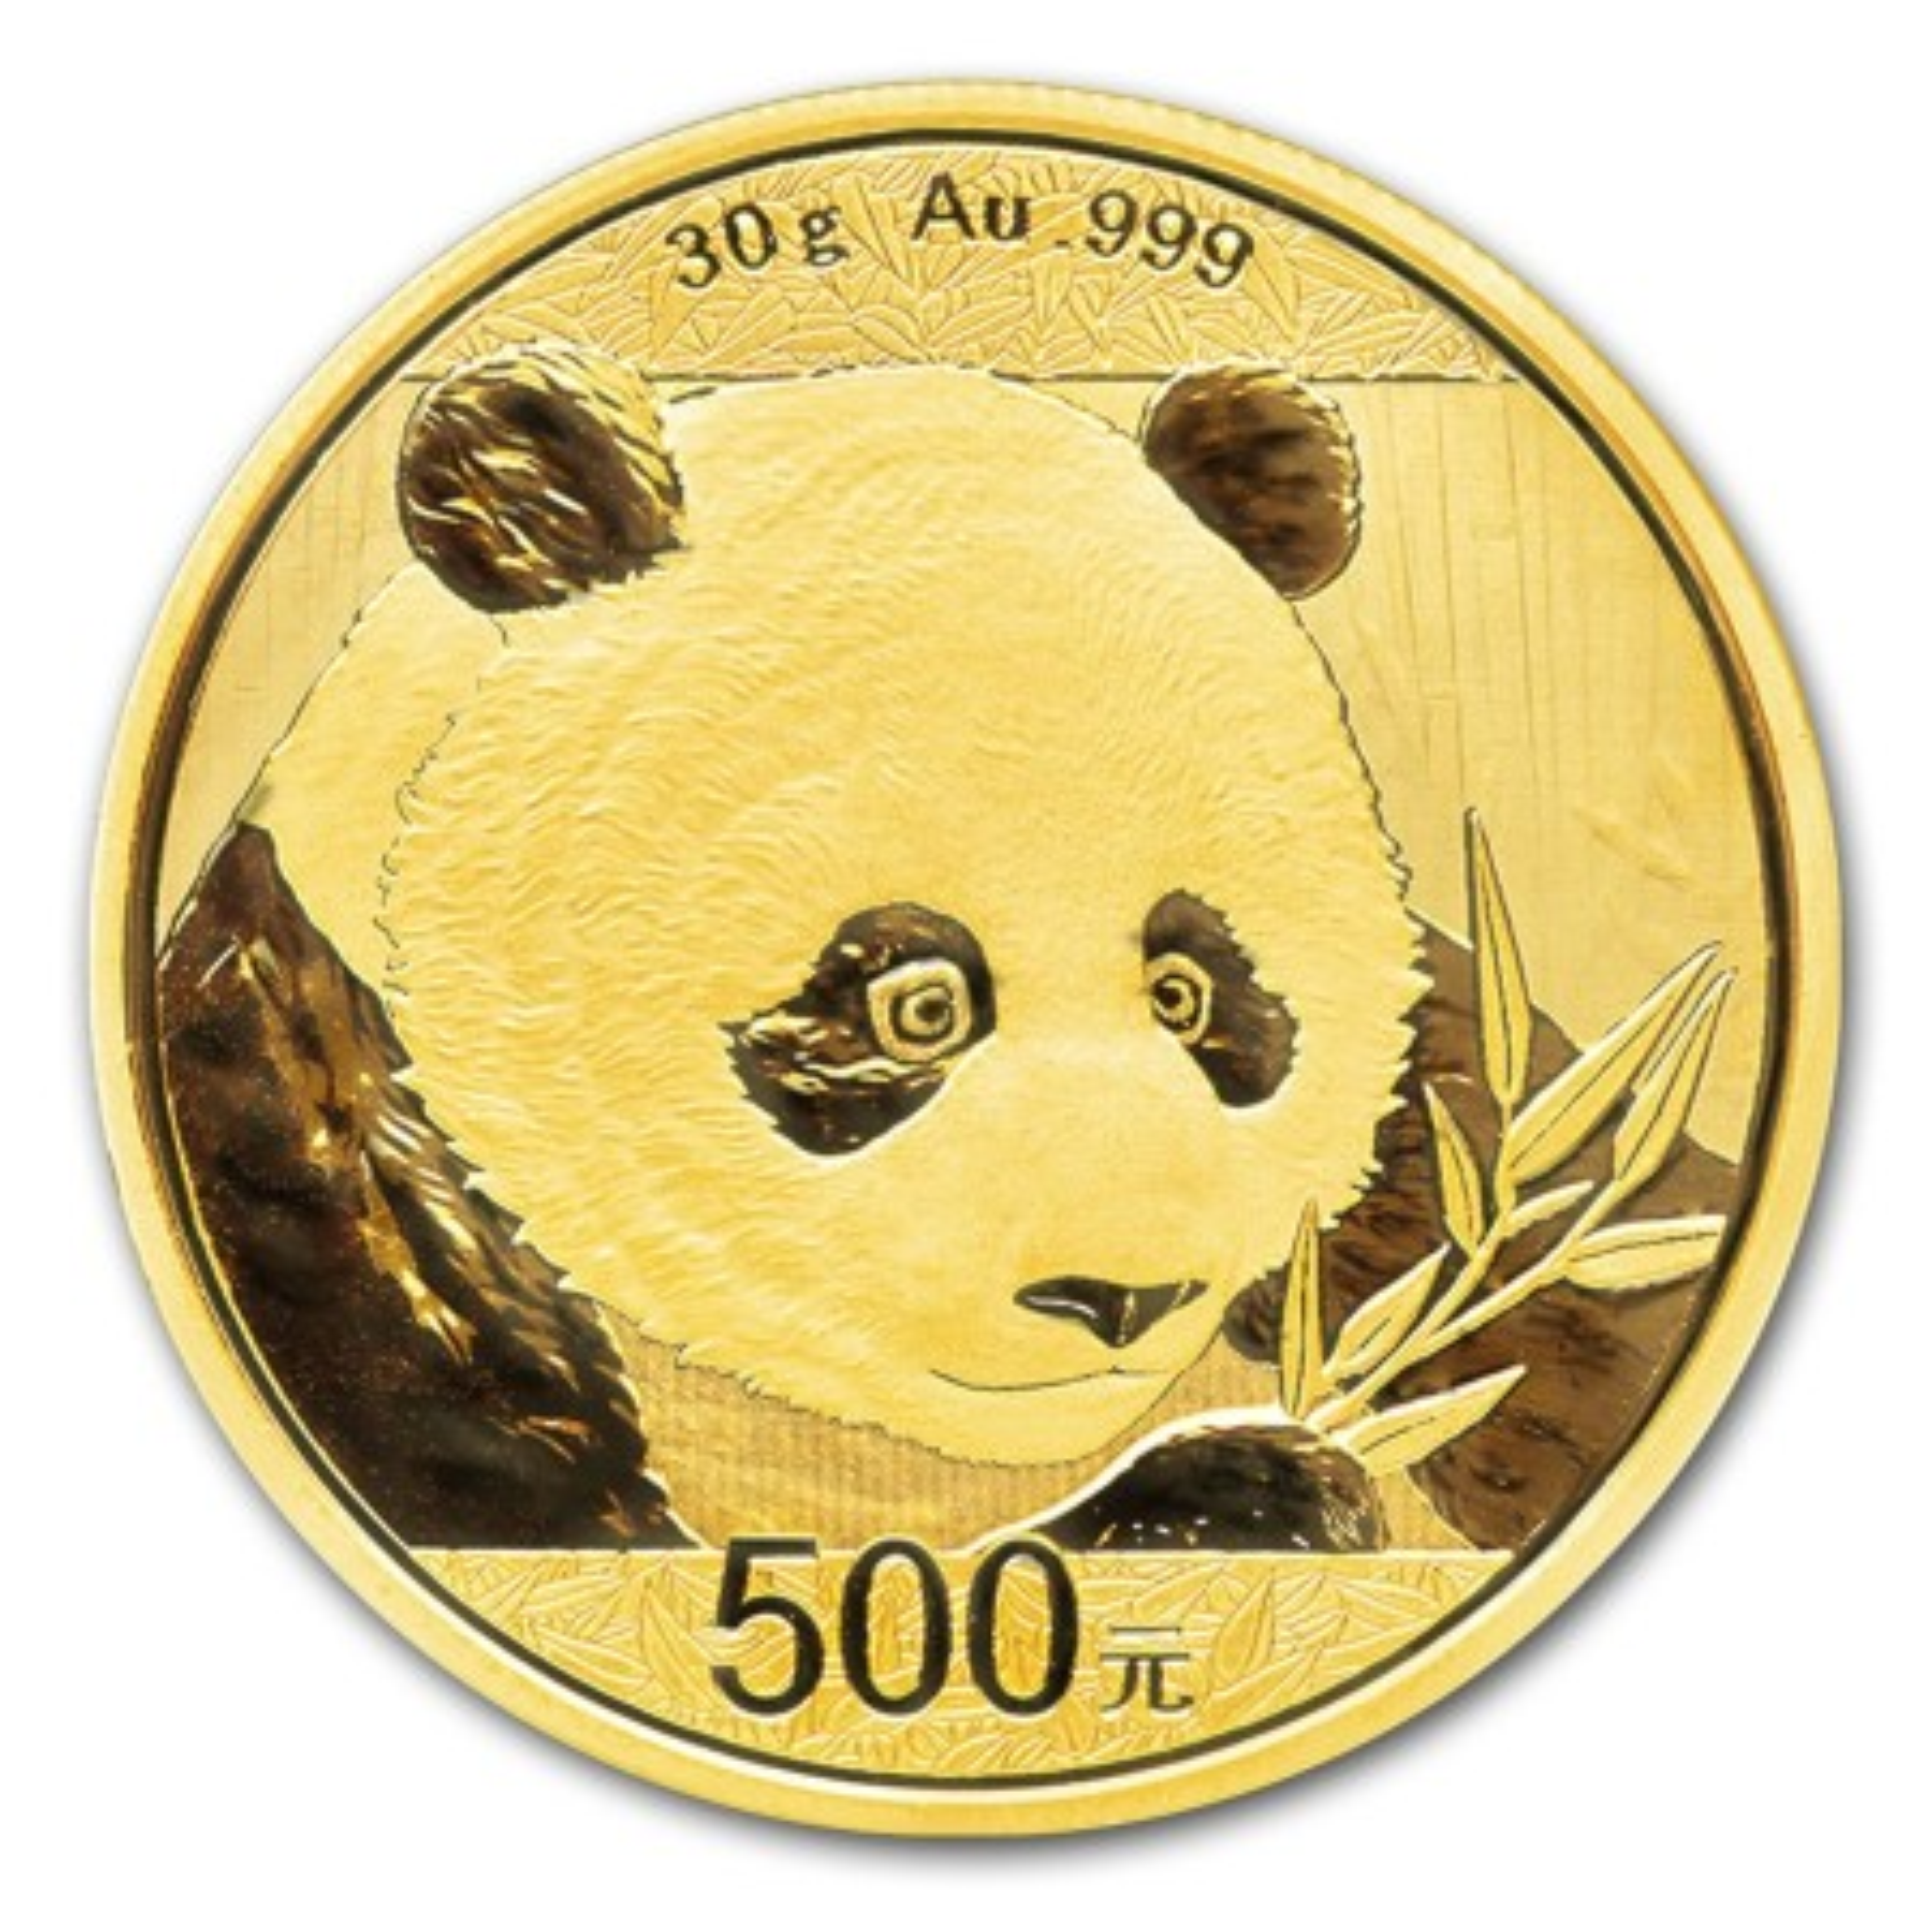 30 Gram gouden Panda munt 2017